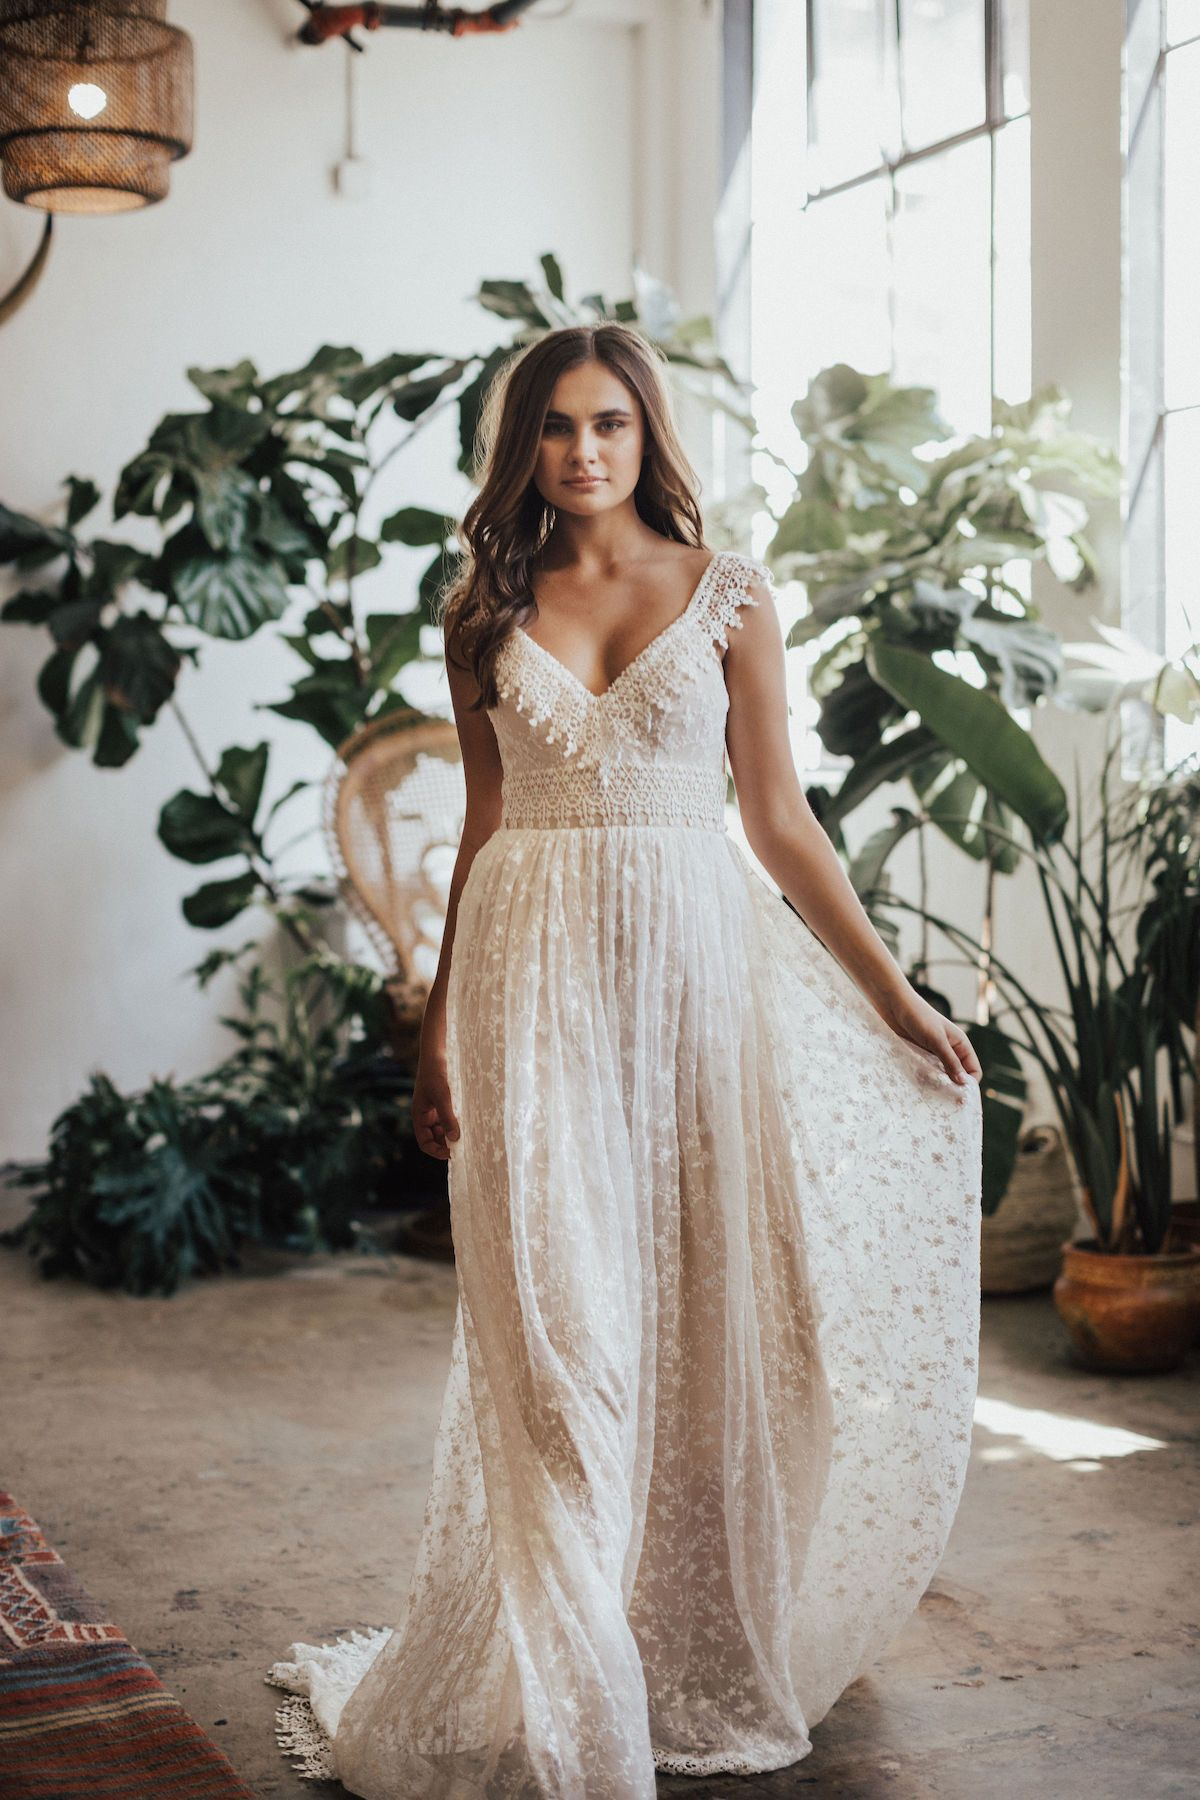 Lupita Bohemian Lace Wedding Dress Classic Wedding Dress Bohemian Wedding Dress Lace Wedding Dress Flowy